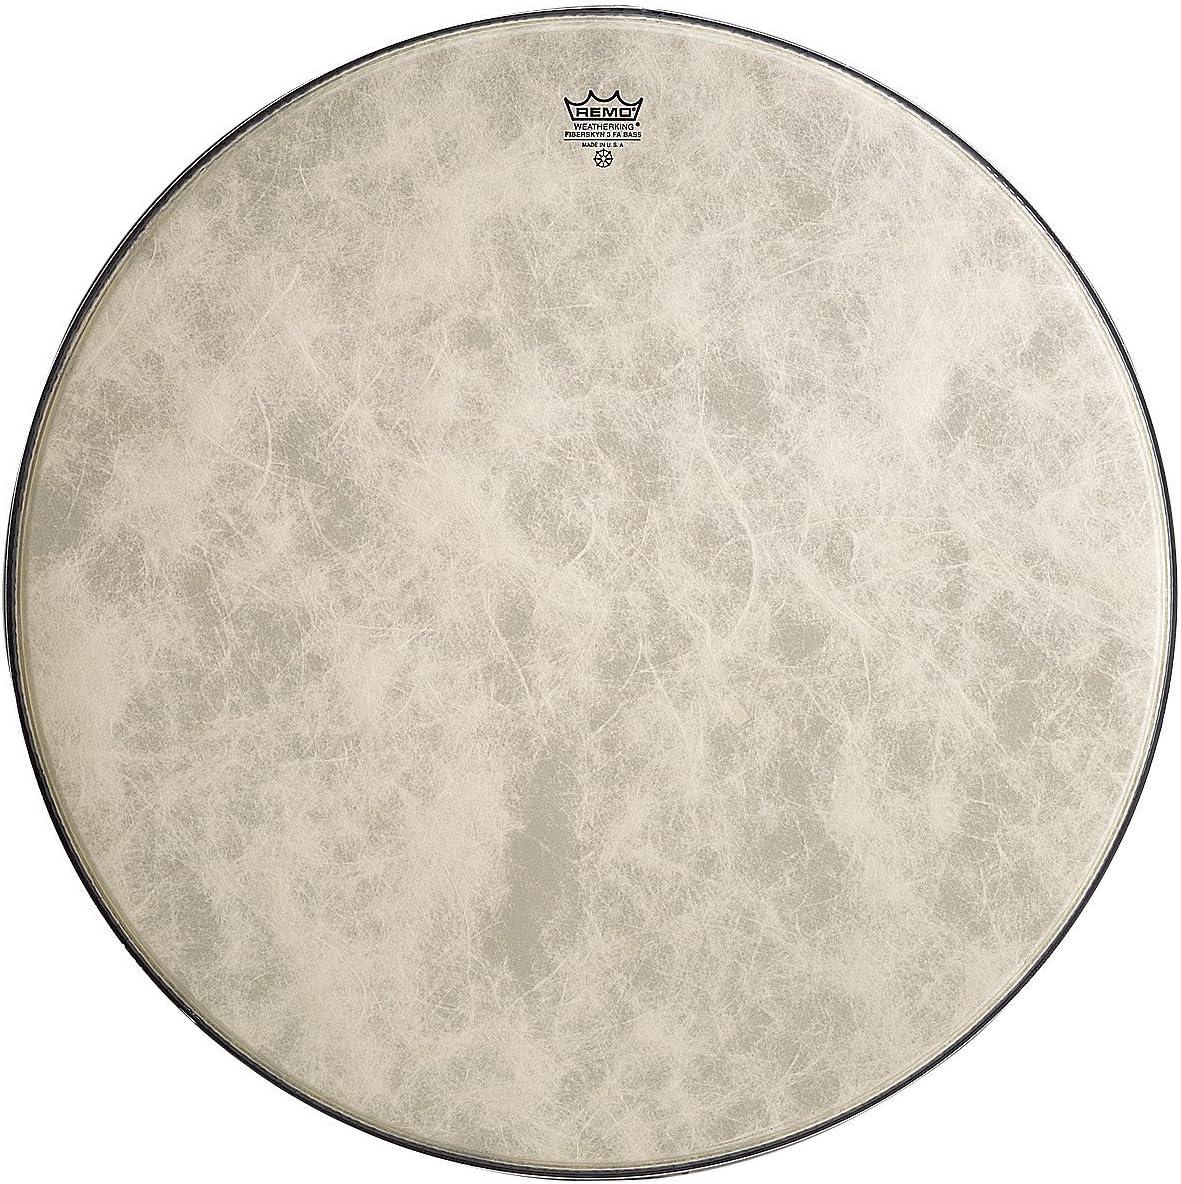 Remo FA1524-00 24-Inch Fiberskyn 3 Ambassador Bass Drum Head